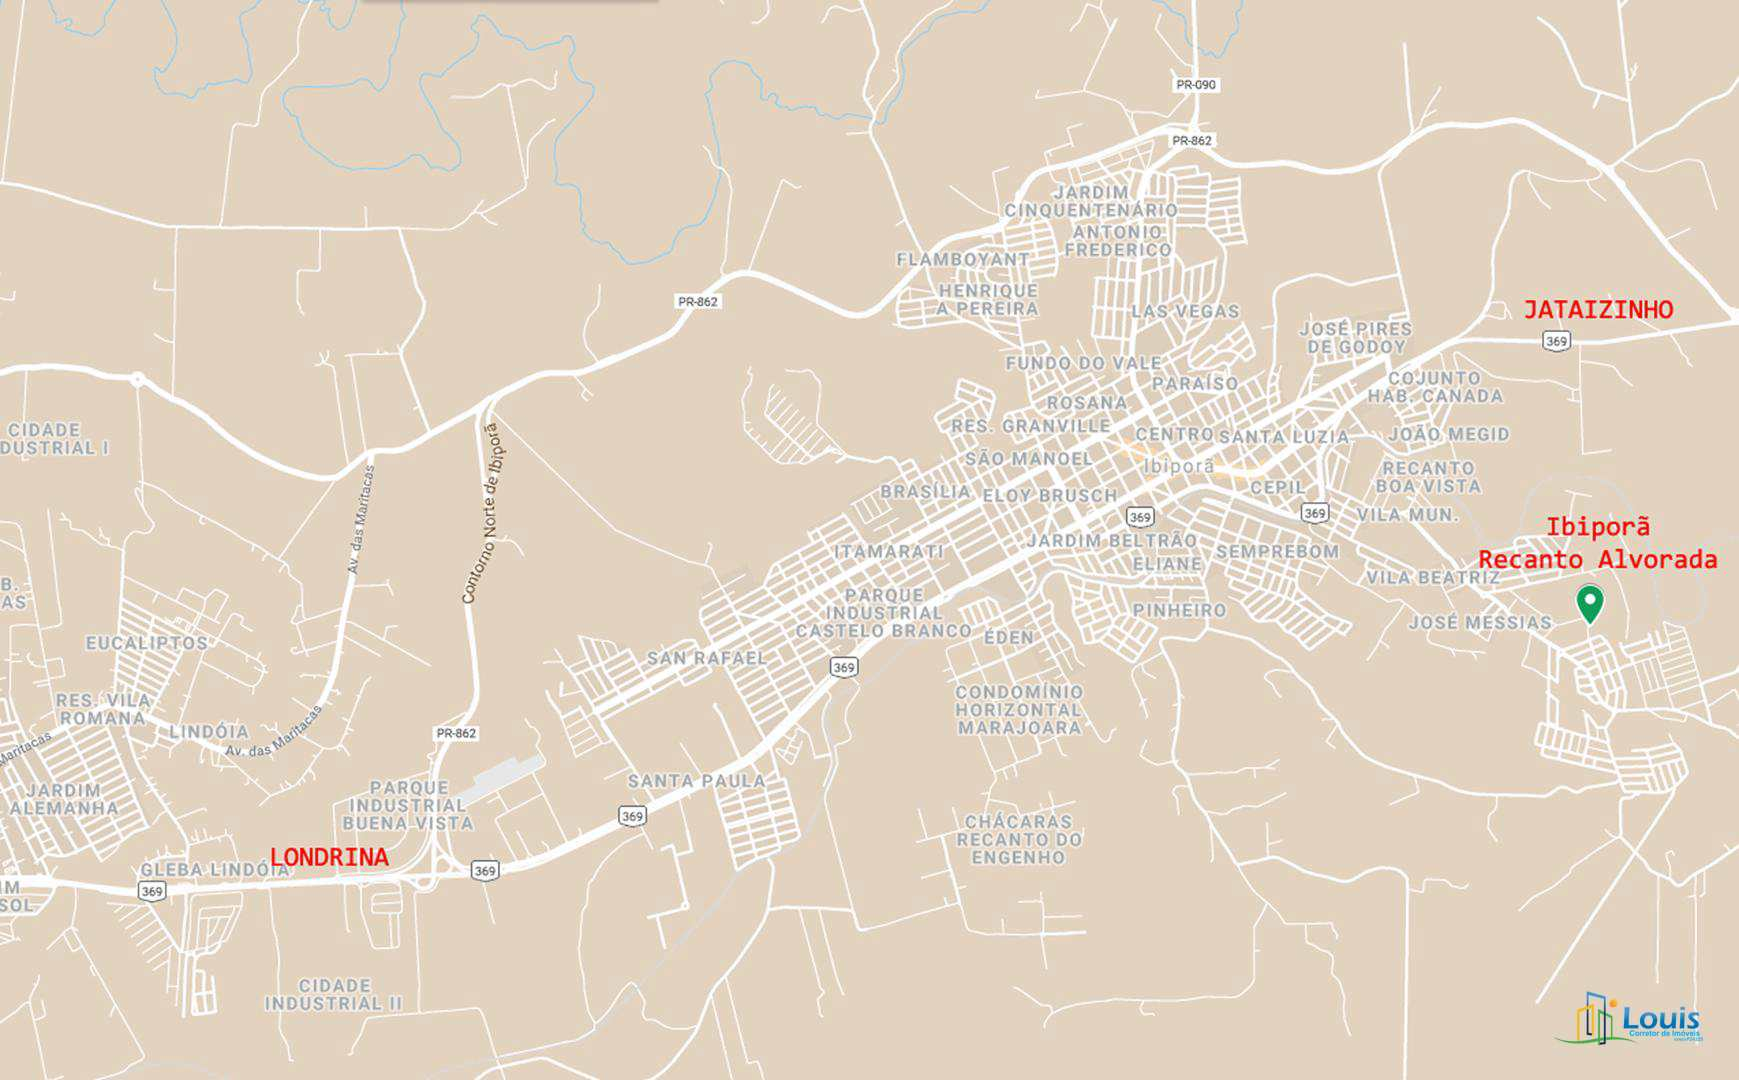 Terreno 250m², Recanto Alvorada (LT 06), Ibiporã/PR